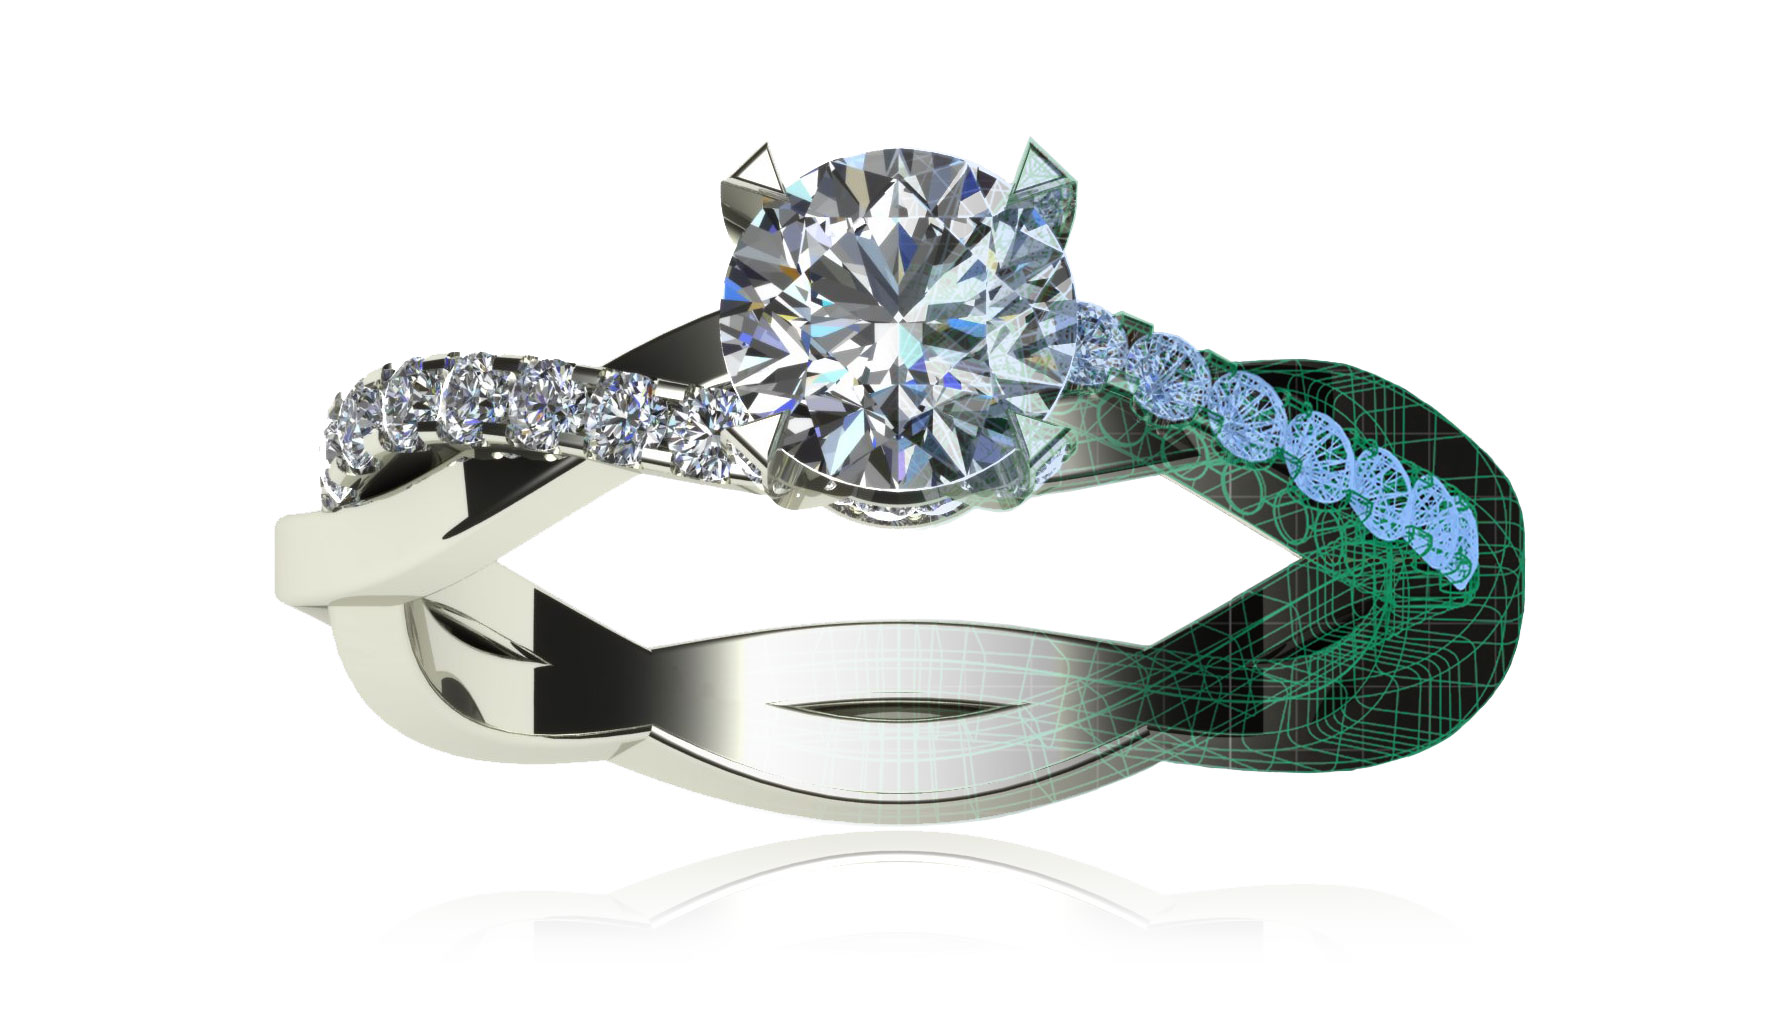 Customized Engagement Ring